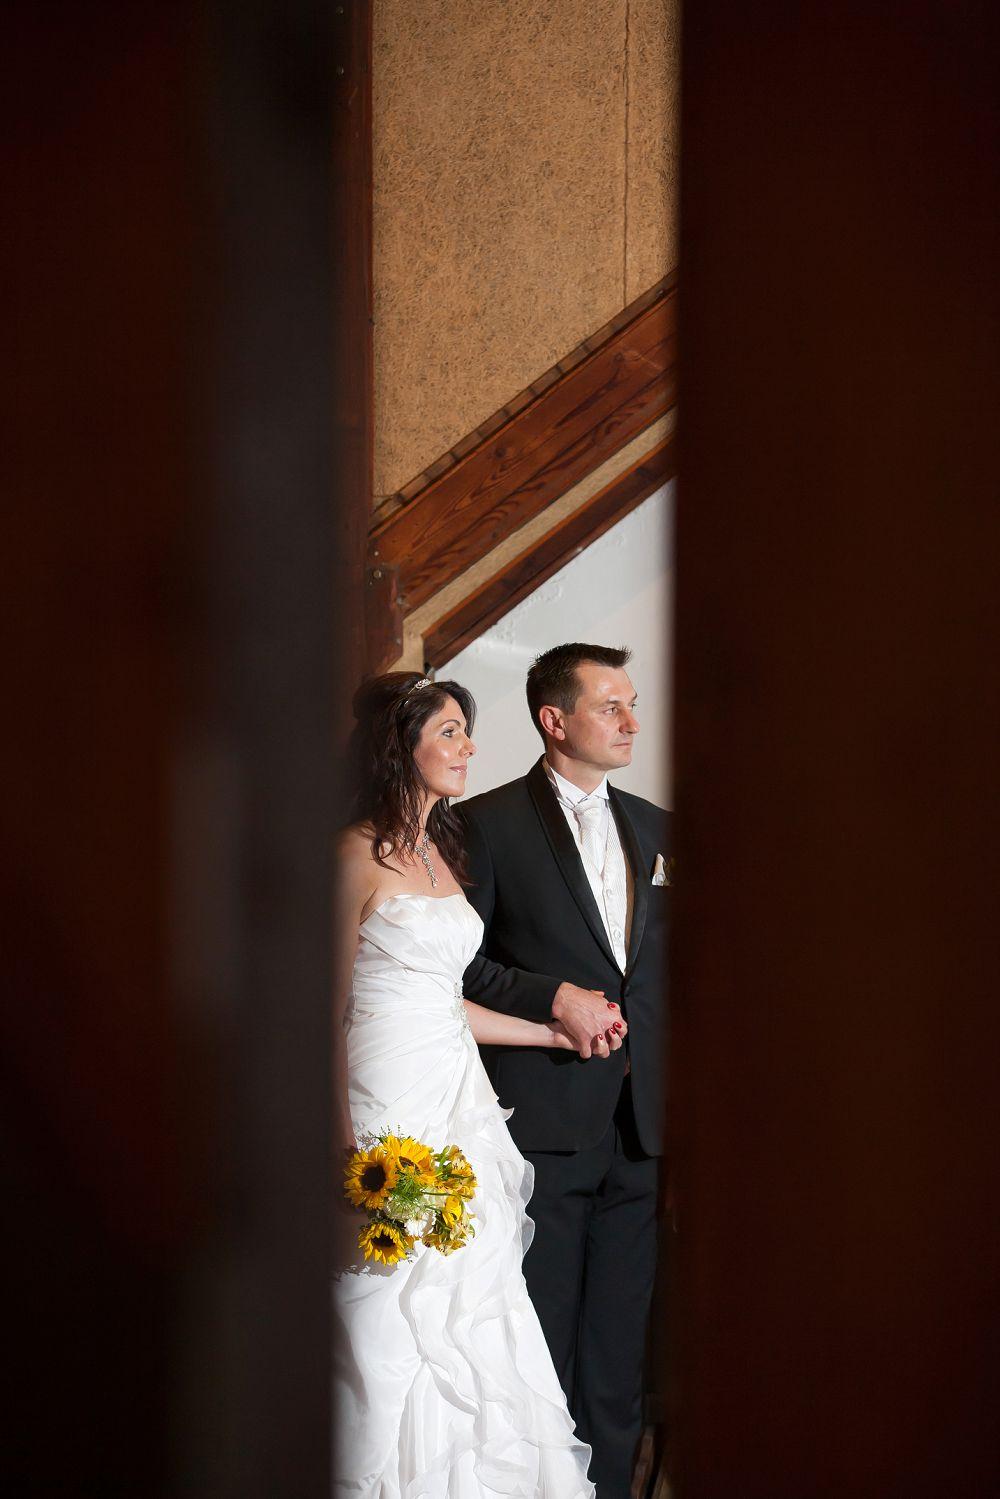 De Malle Meul Wedding Expressions Photography032